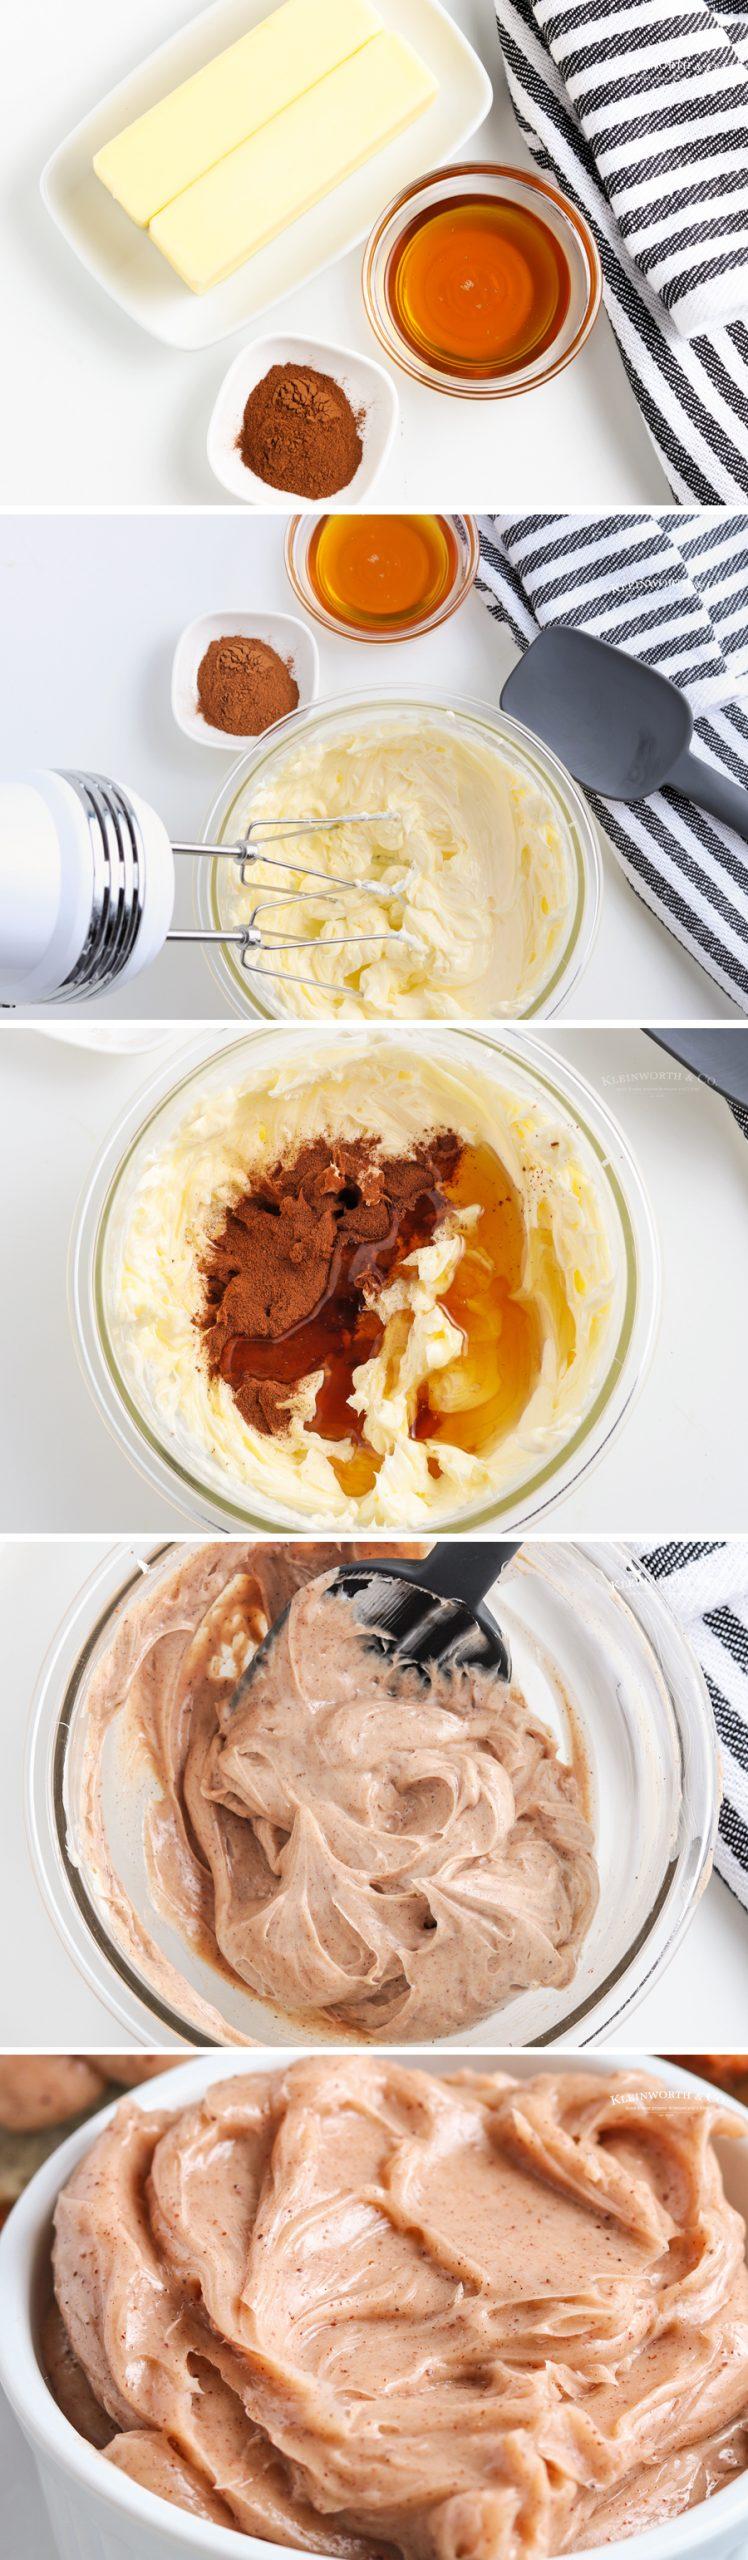 how to make Cinnamon Honey Butter